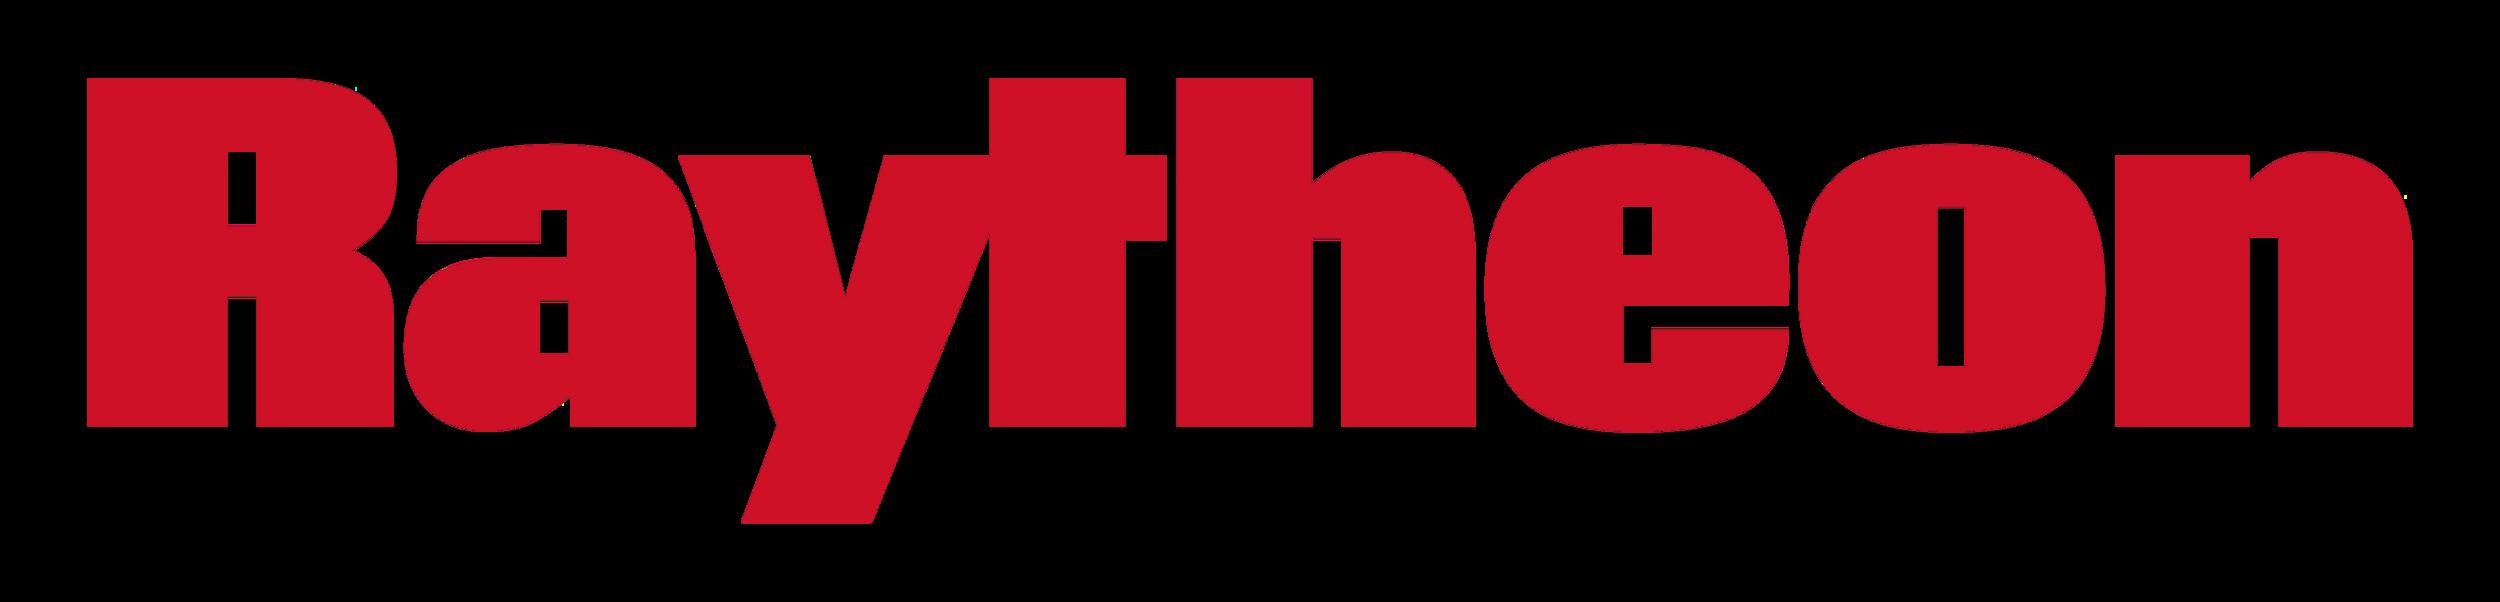 purepng.com-raytheon-logologobrand-logoiconslogos-2515199402991ssaz.png